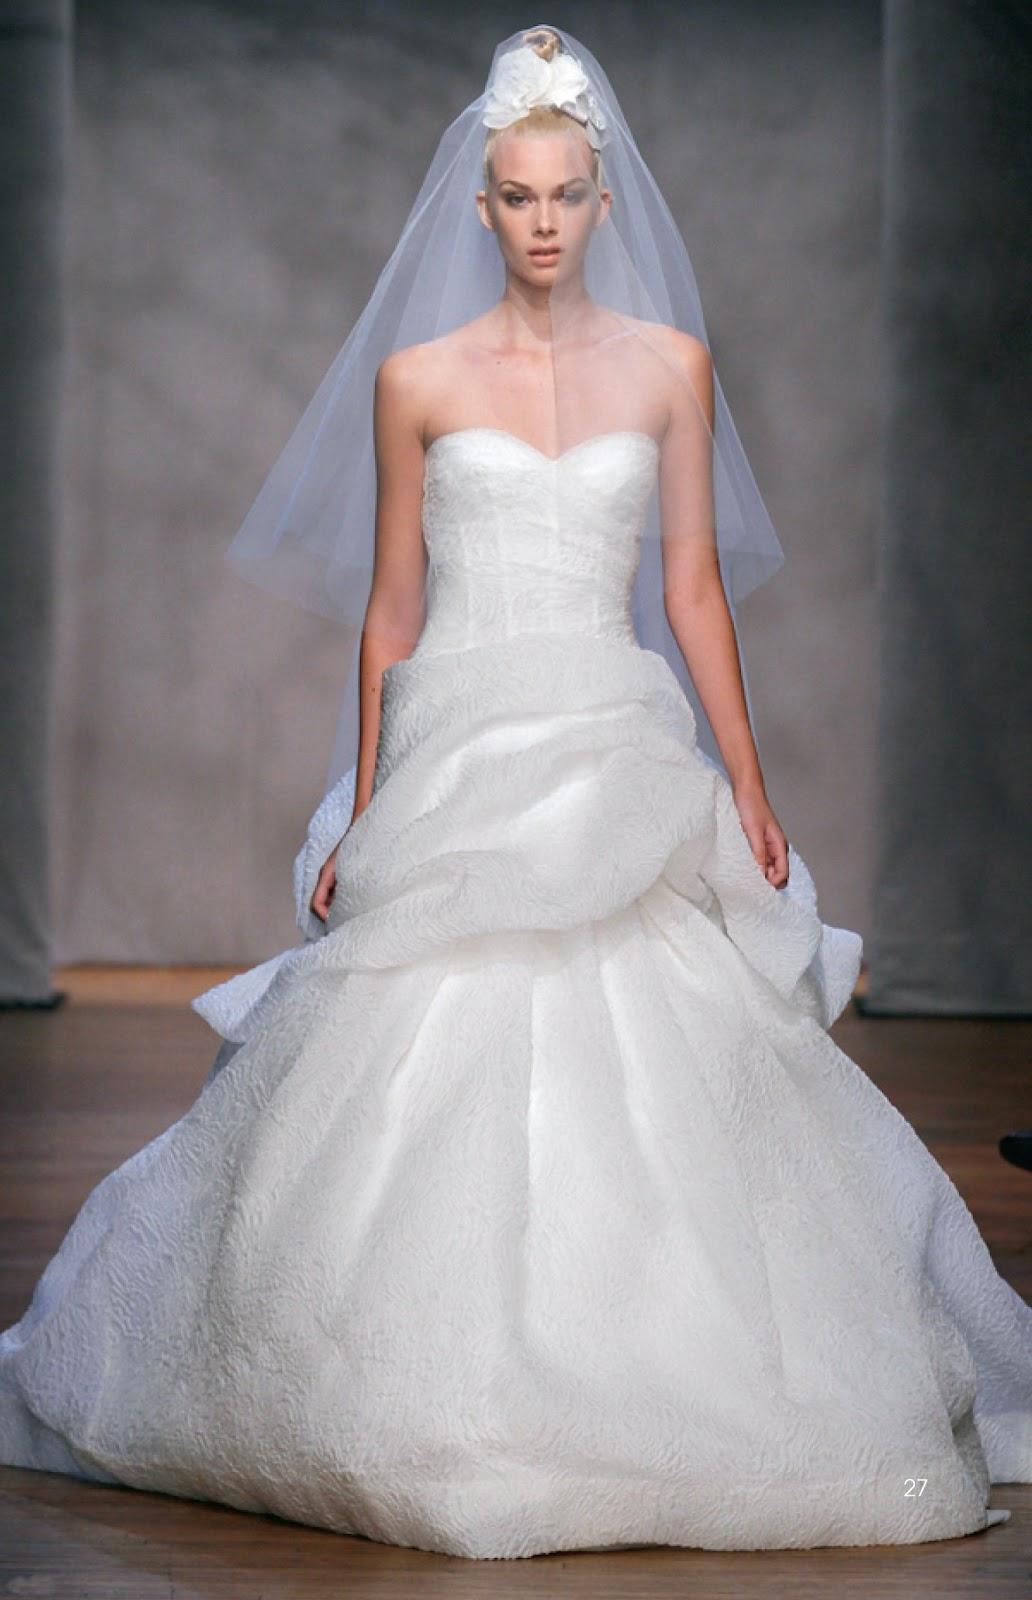 Honey Buy Interpretation of Western style wedding dress